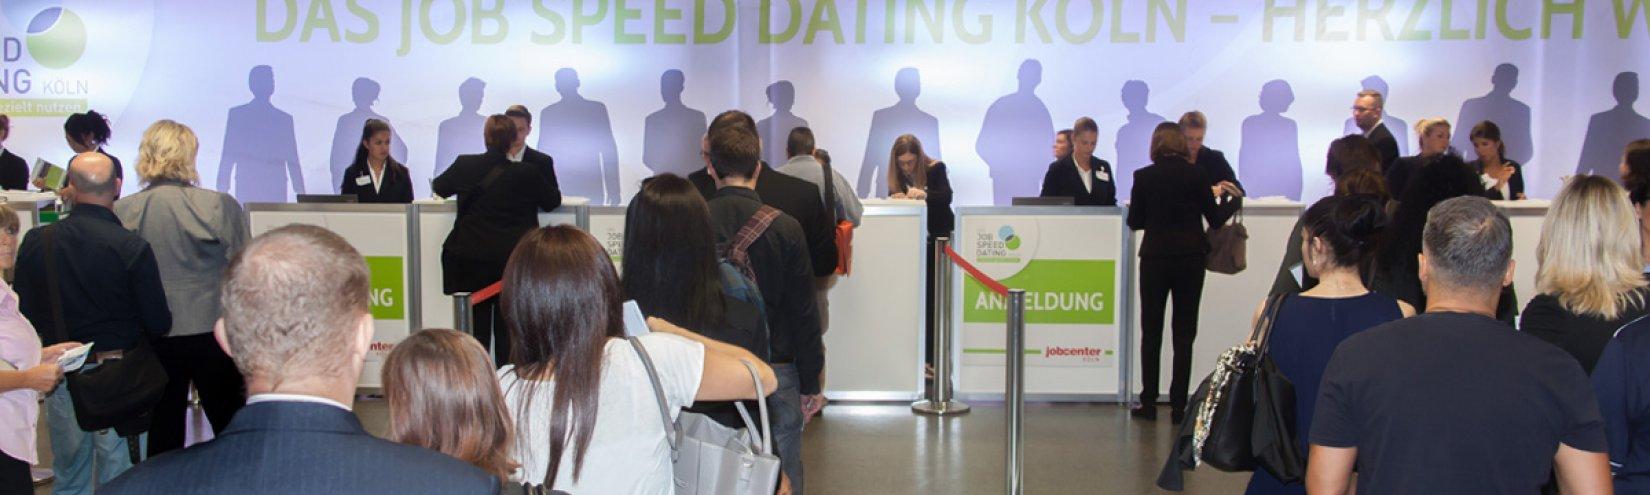 yli 50 online dating